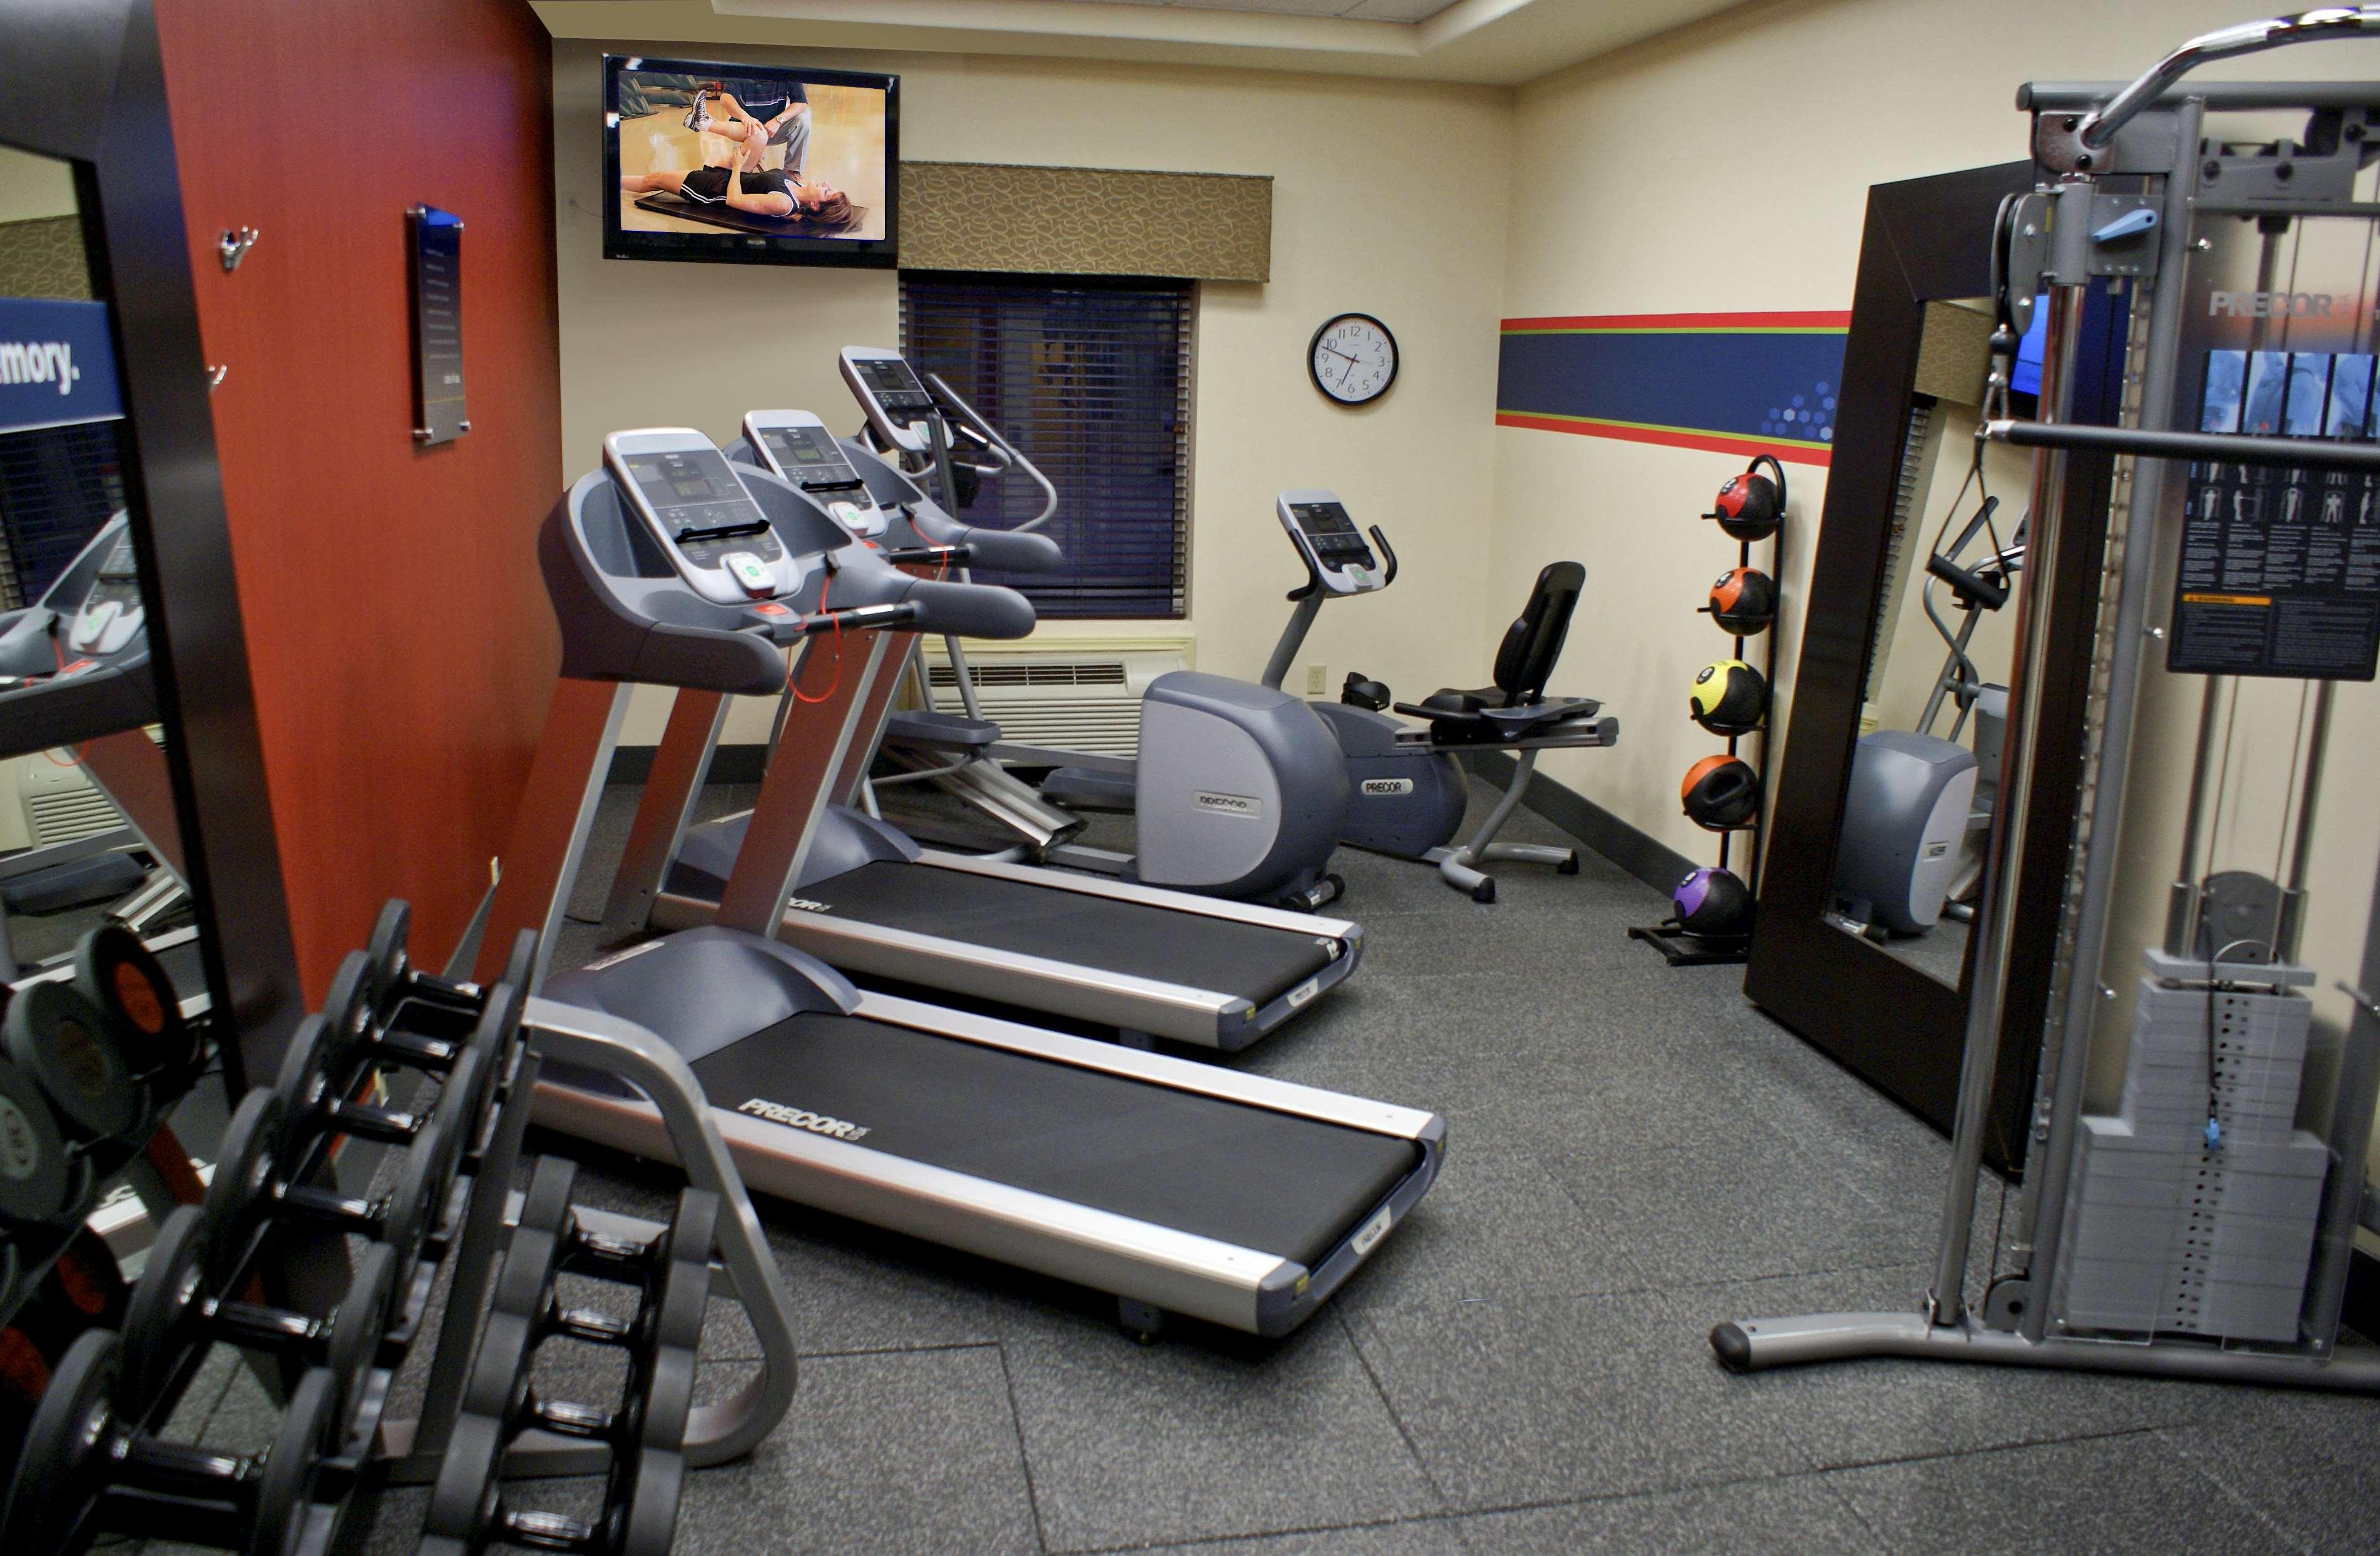 Hampton Inn Orange image 20